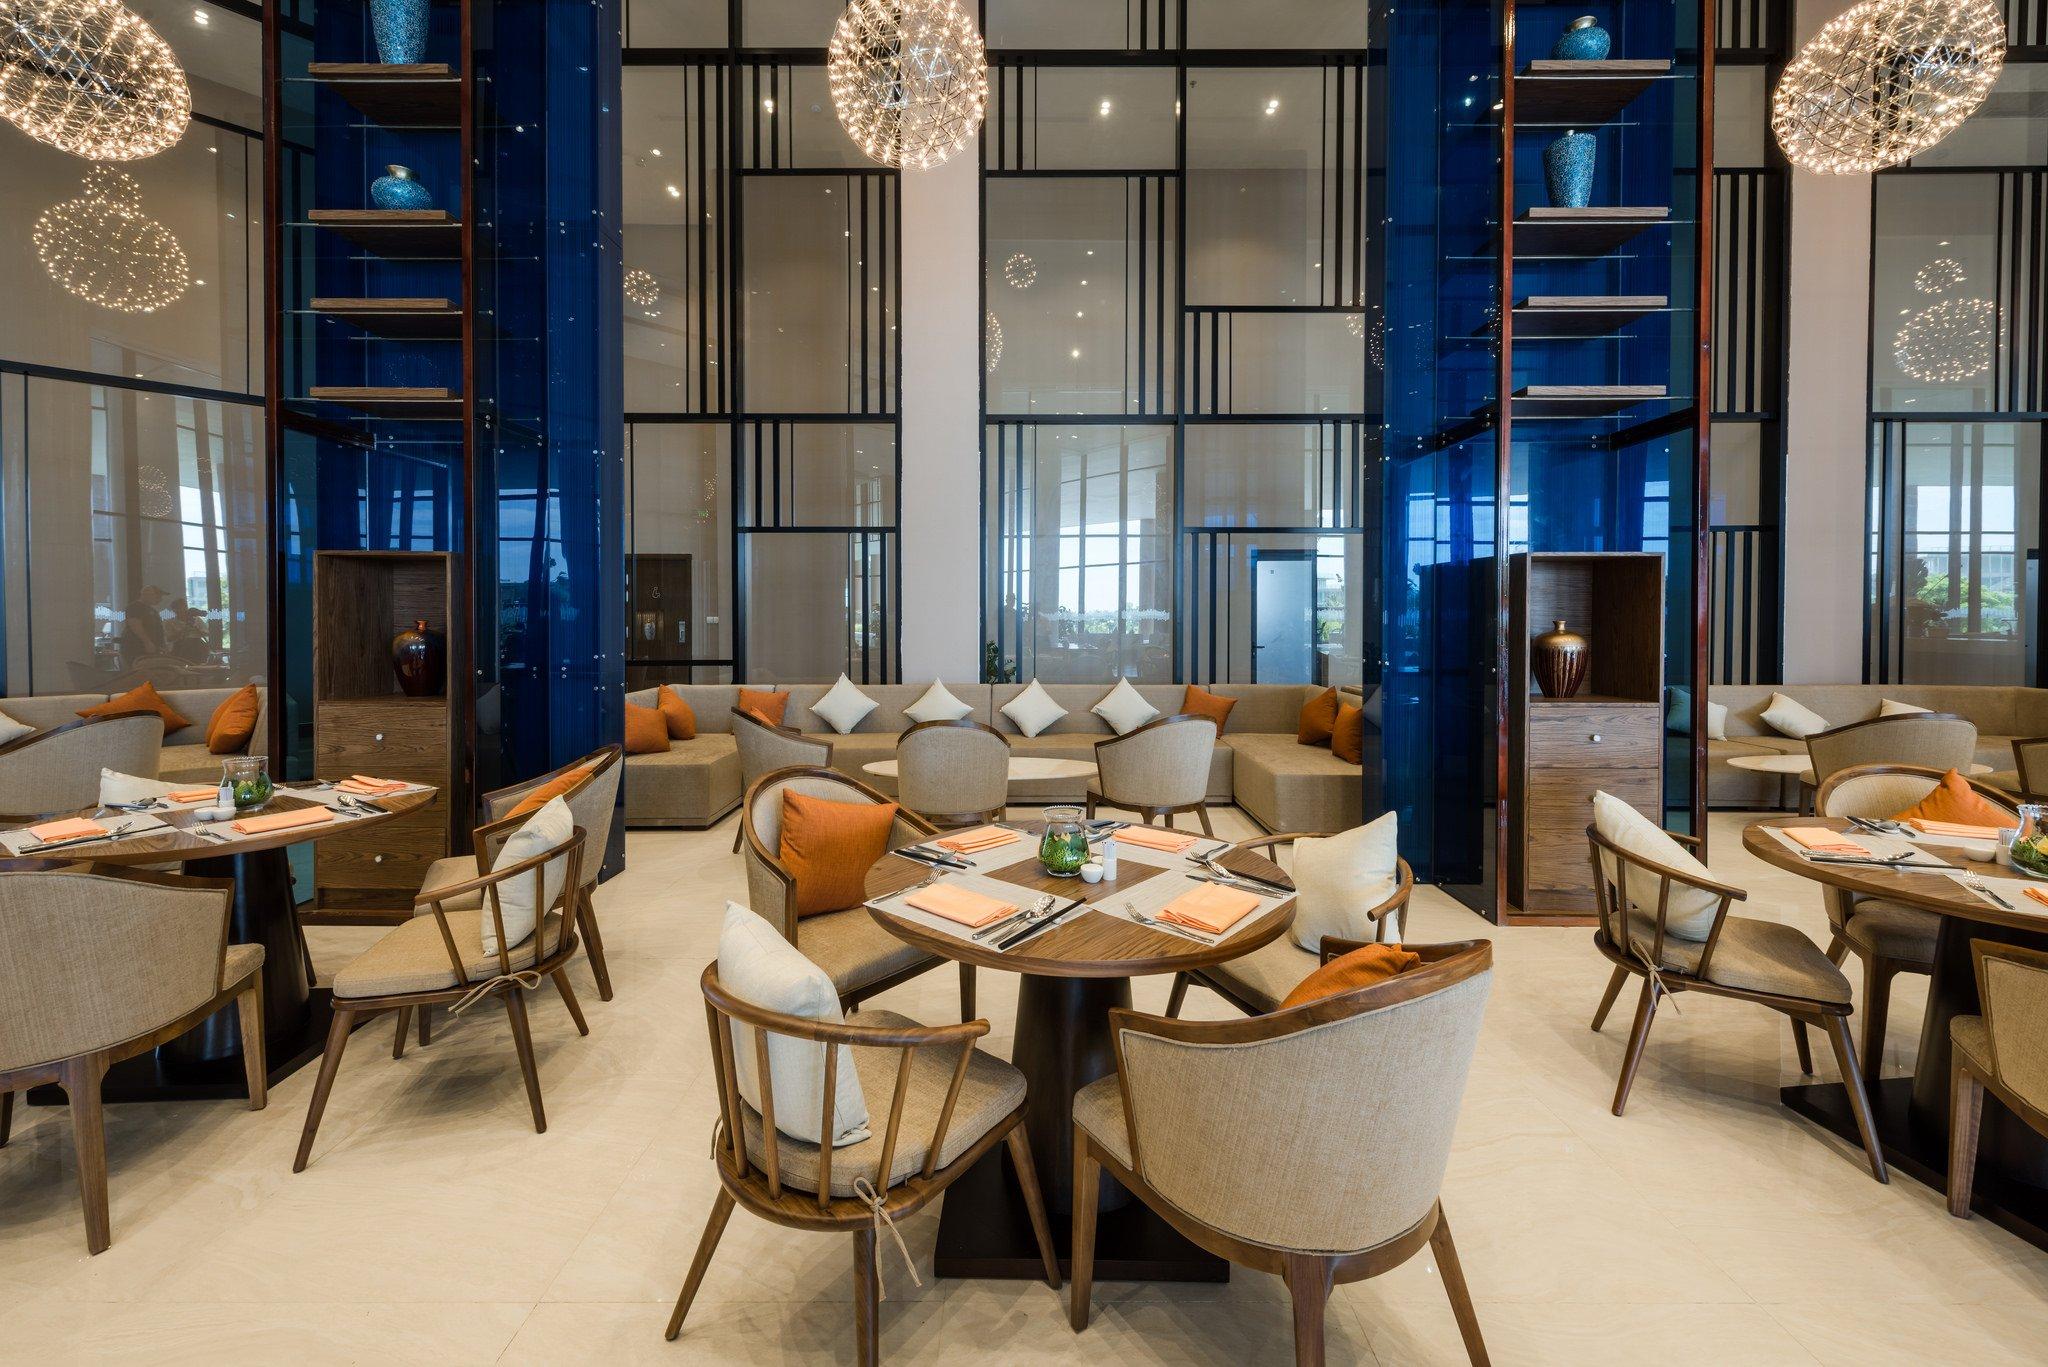 Seagull Restaurant - FLC  Grand Hotel Sầm Sơn